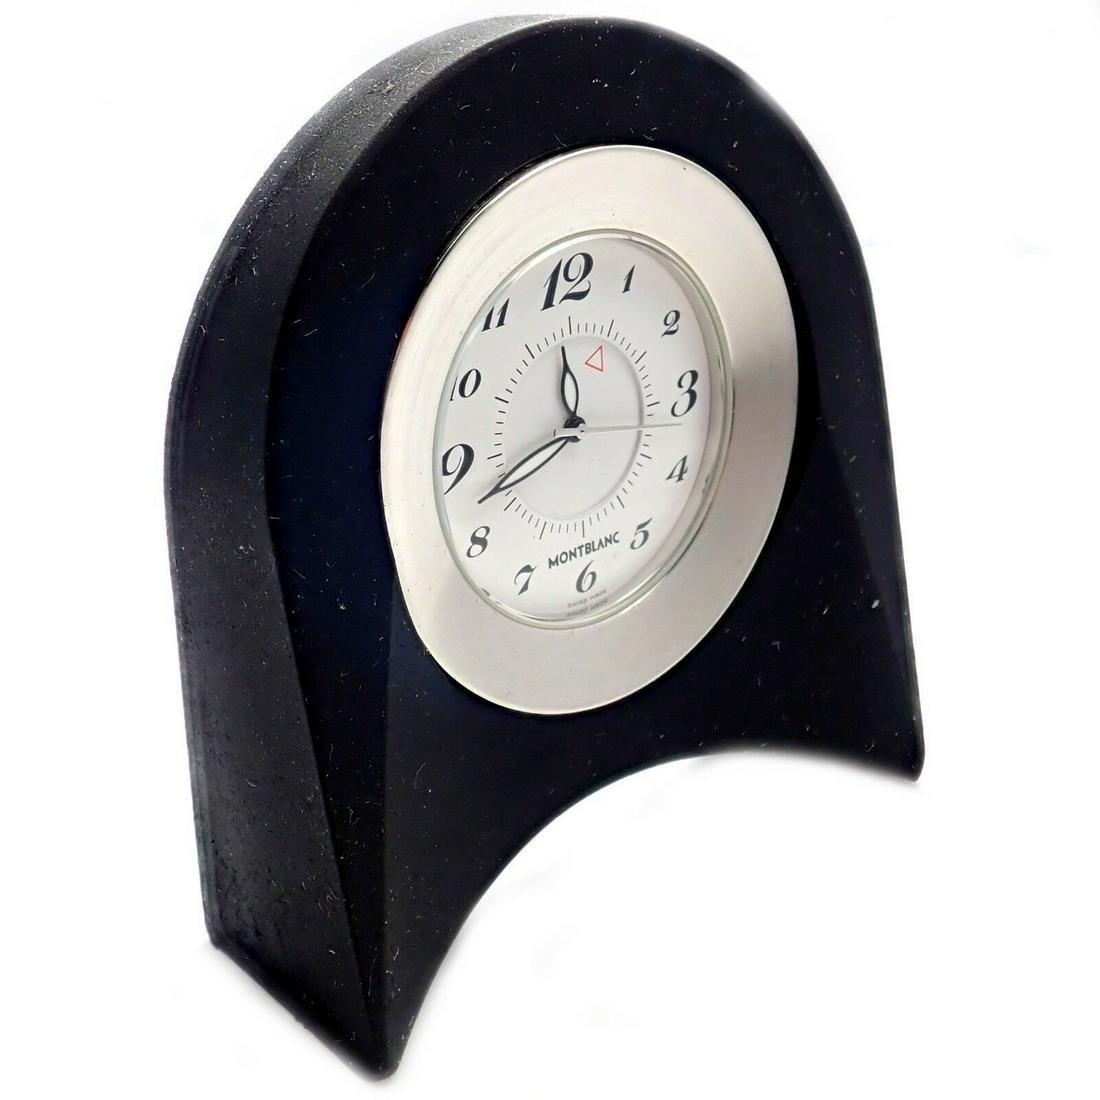 Montblanc Black Rubber Desk Travel Alarm Clock W/ Box